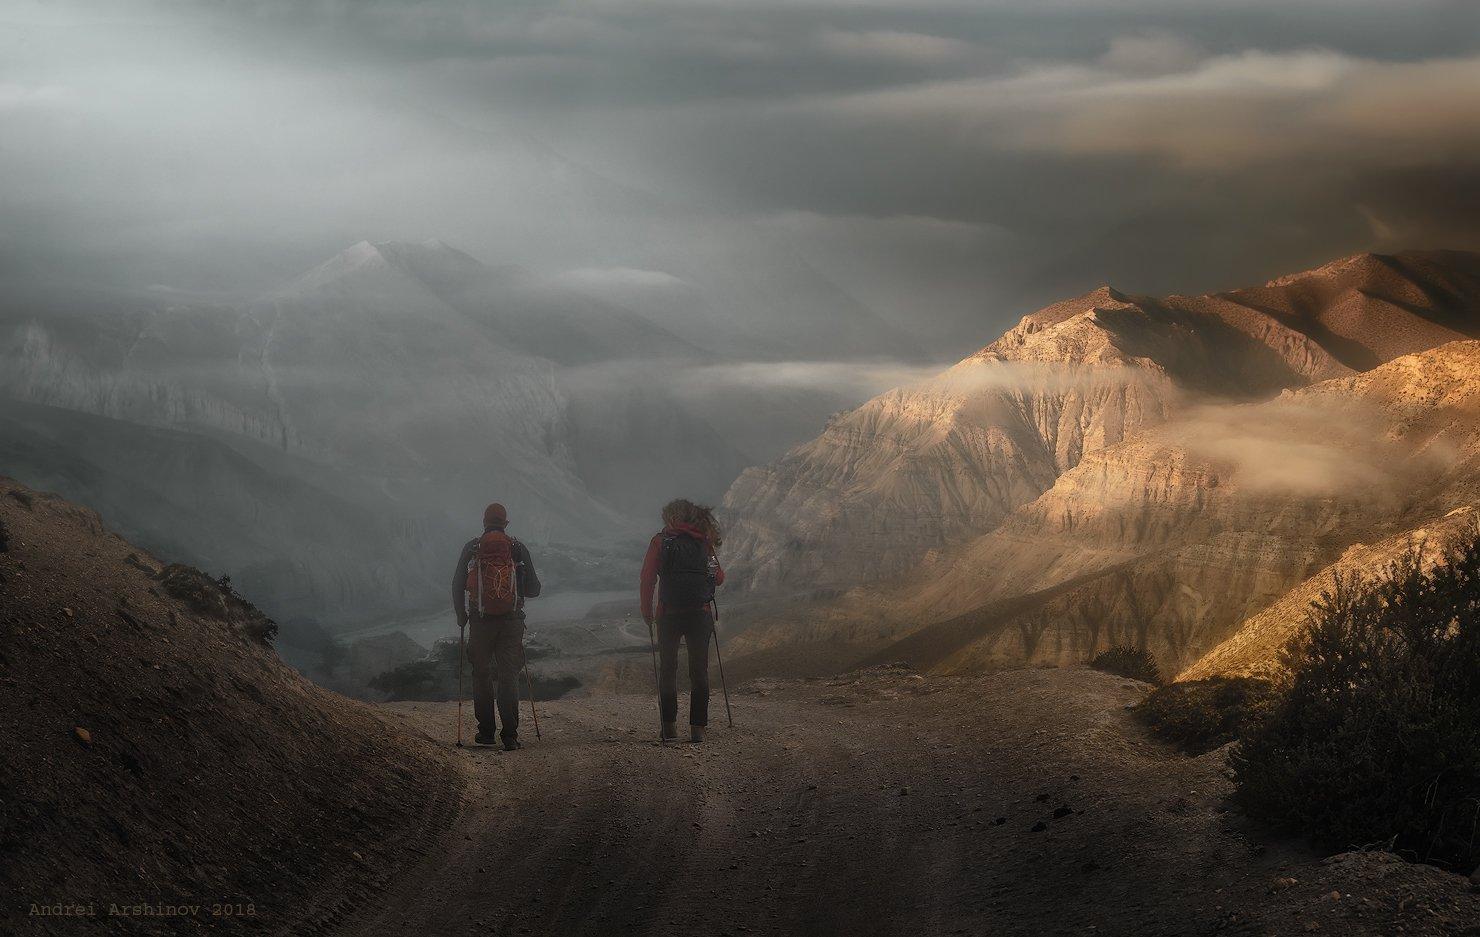 верхний мустанг, непал, nepal, upper mustang, landscape, mountains, Soft Light